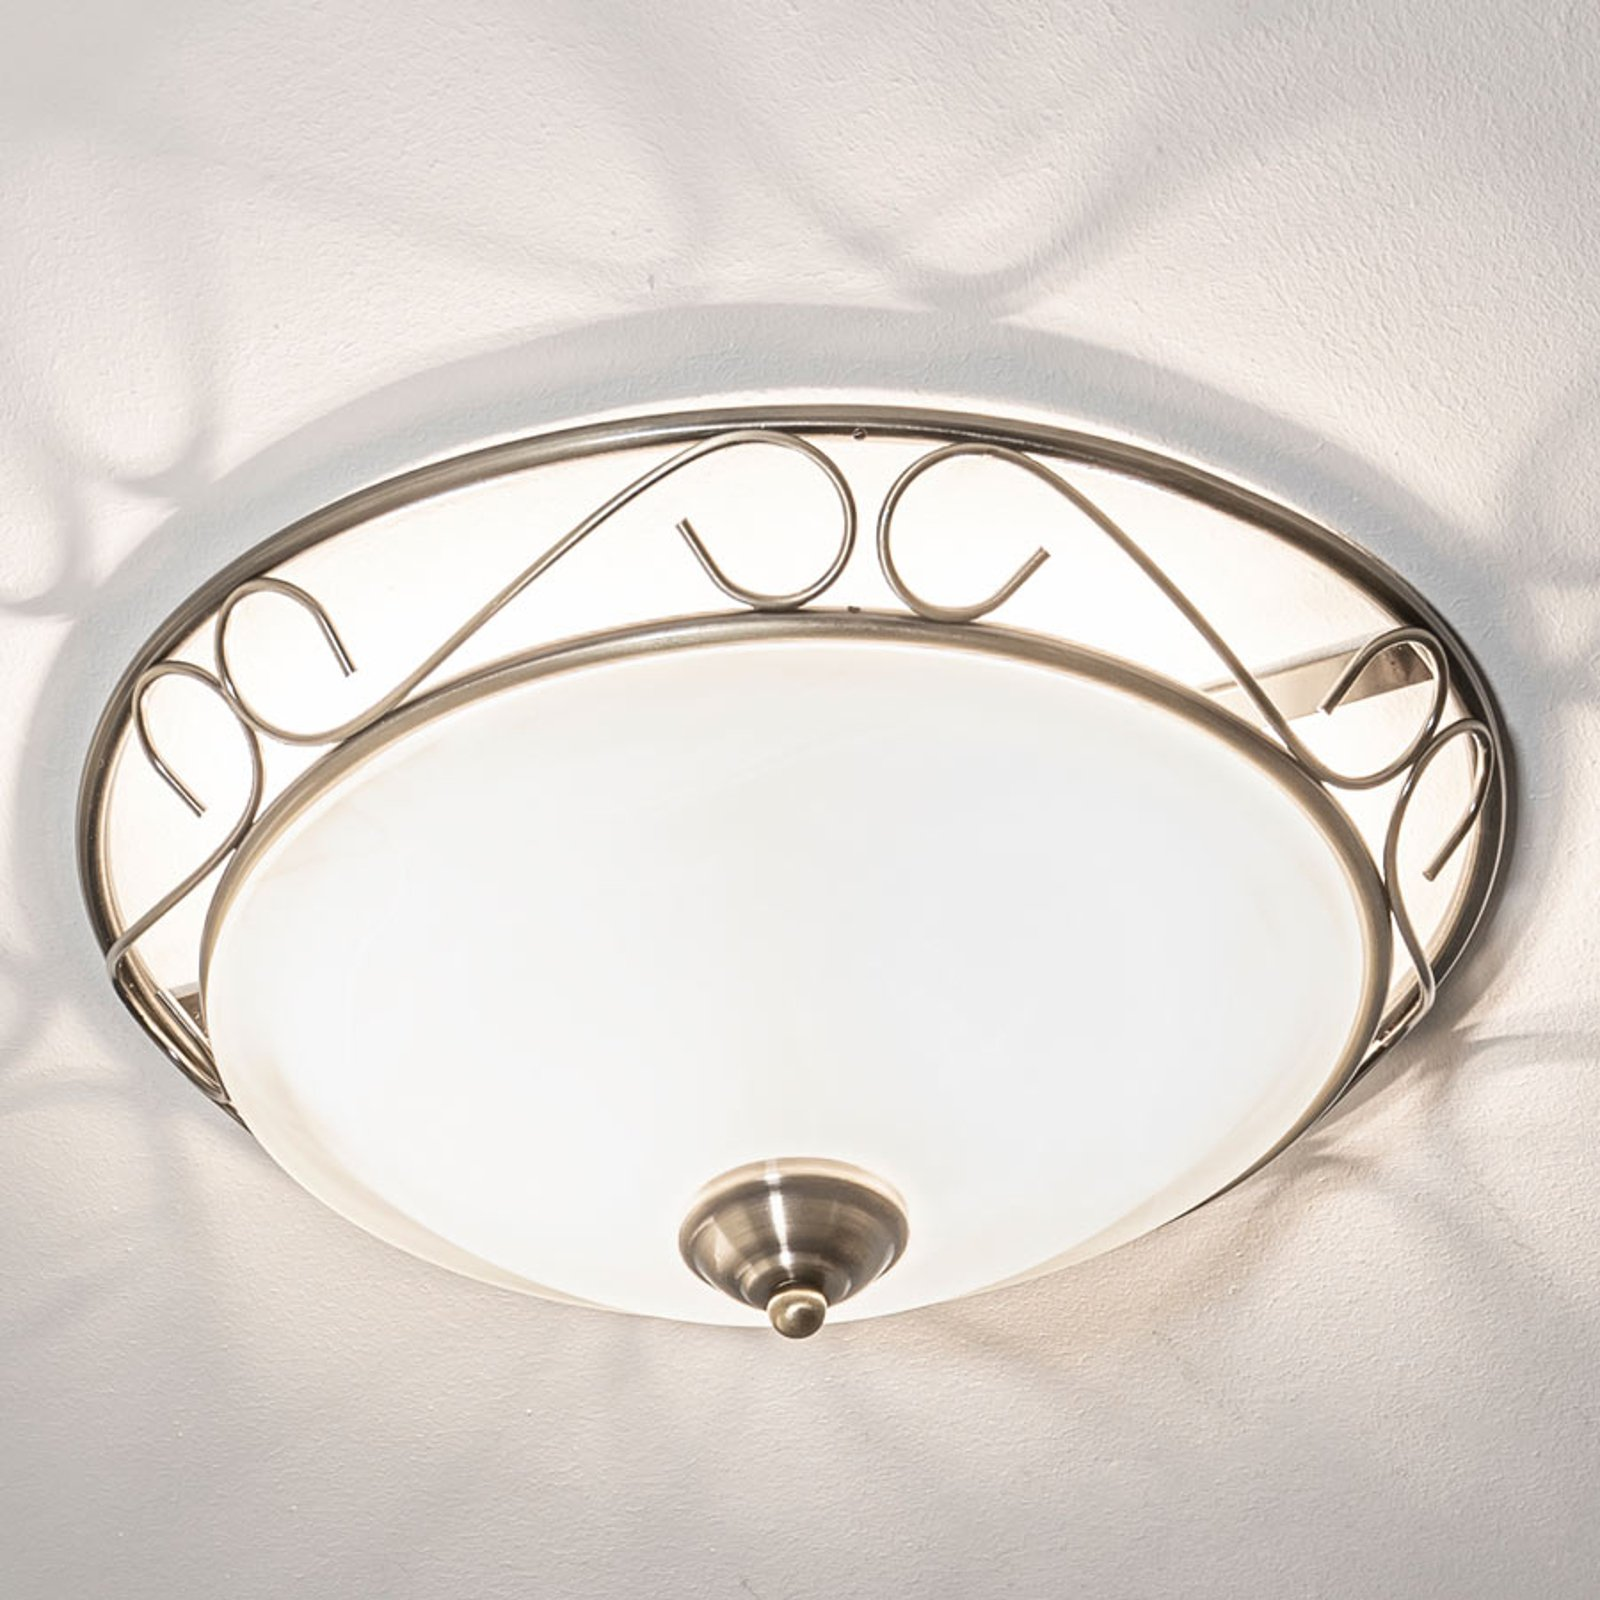 ANNEKE - romantisk-yndig taklampe